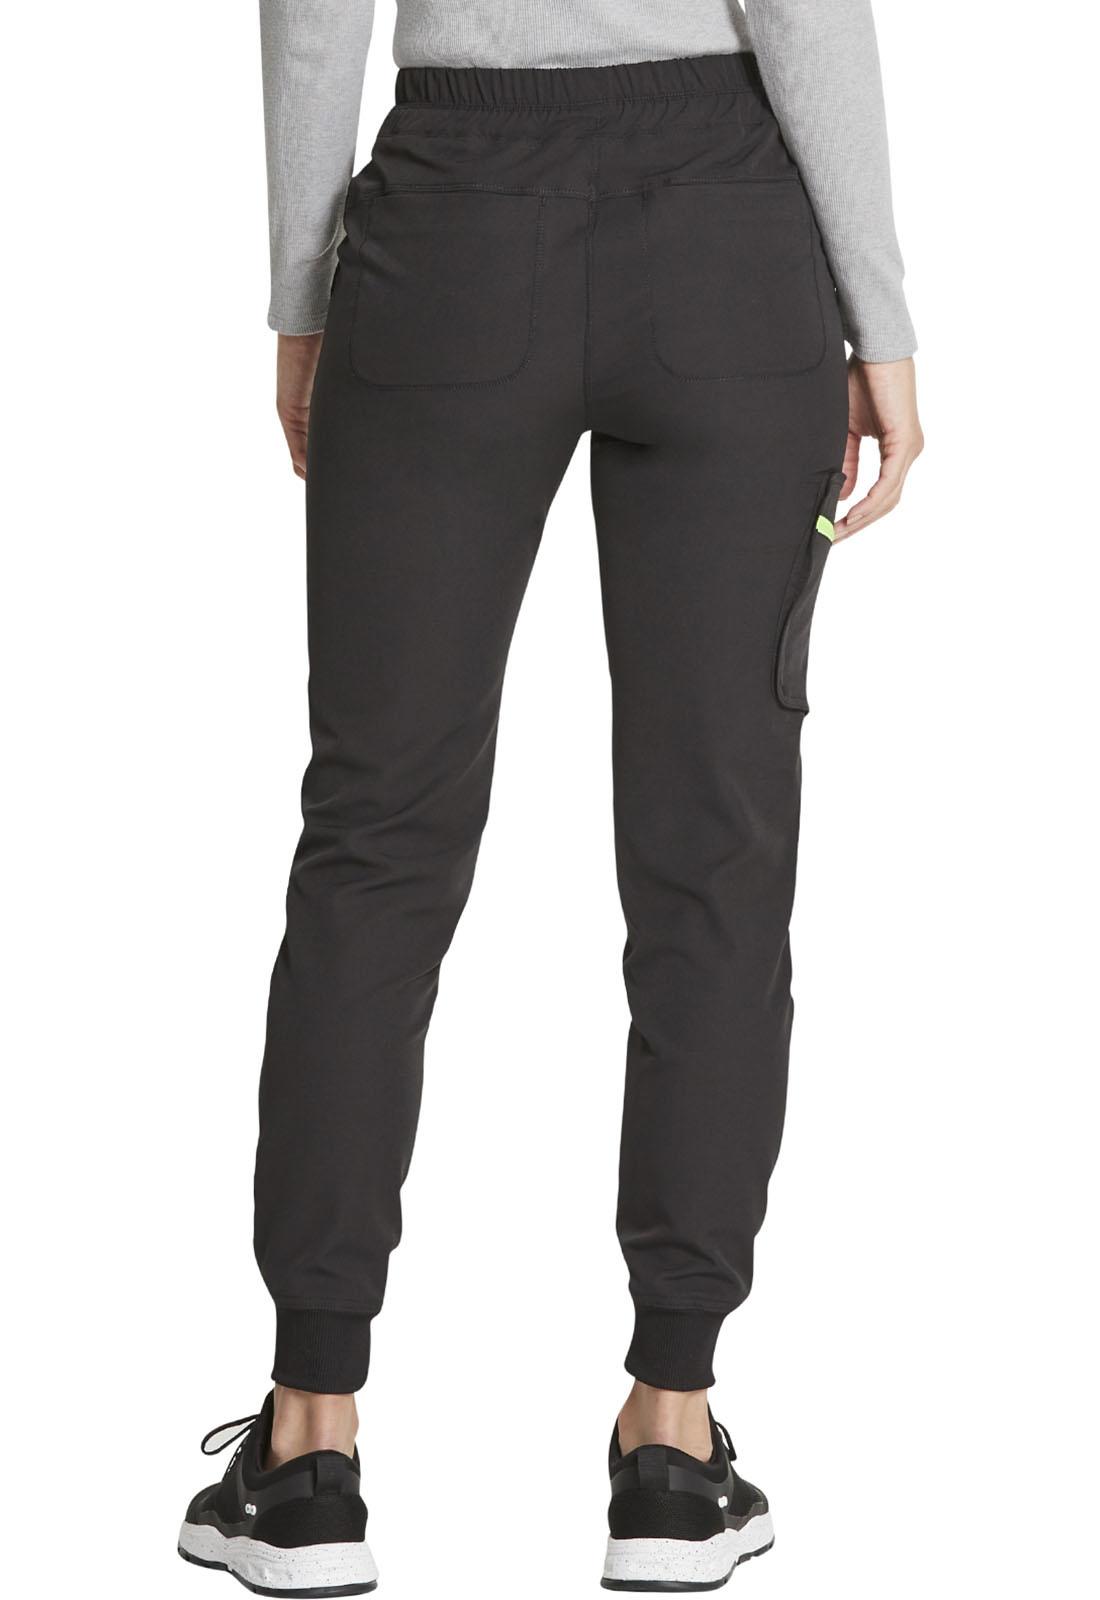 DICKIES Black Women's Jogger Scrub Pants DK234-BLK